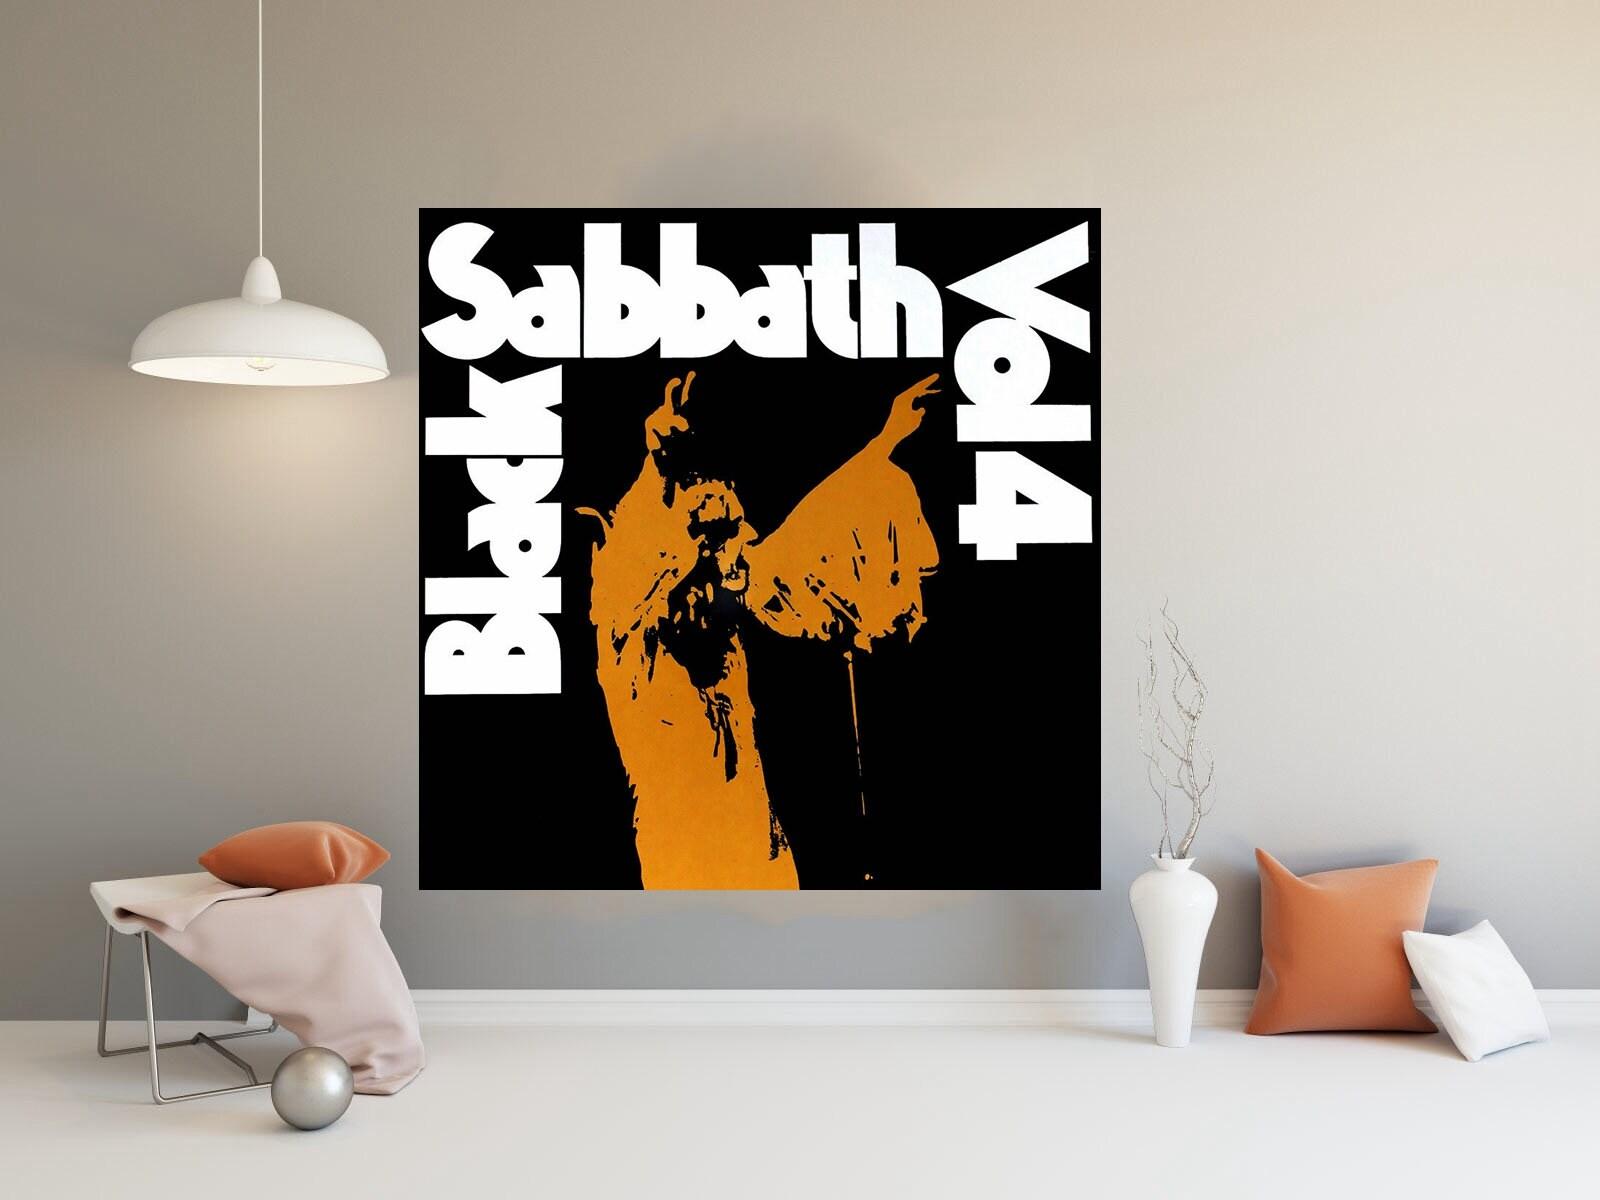 21 Savage Issa Album New Music Silk Poster 13x20 24x36 inch